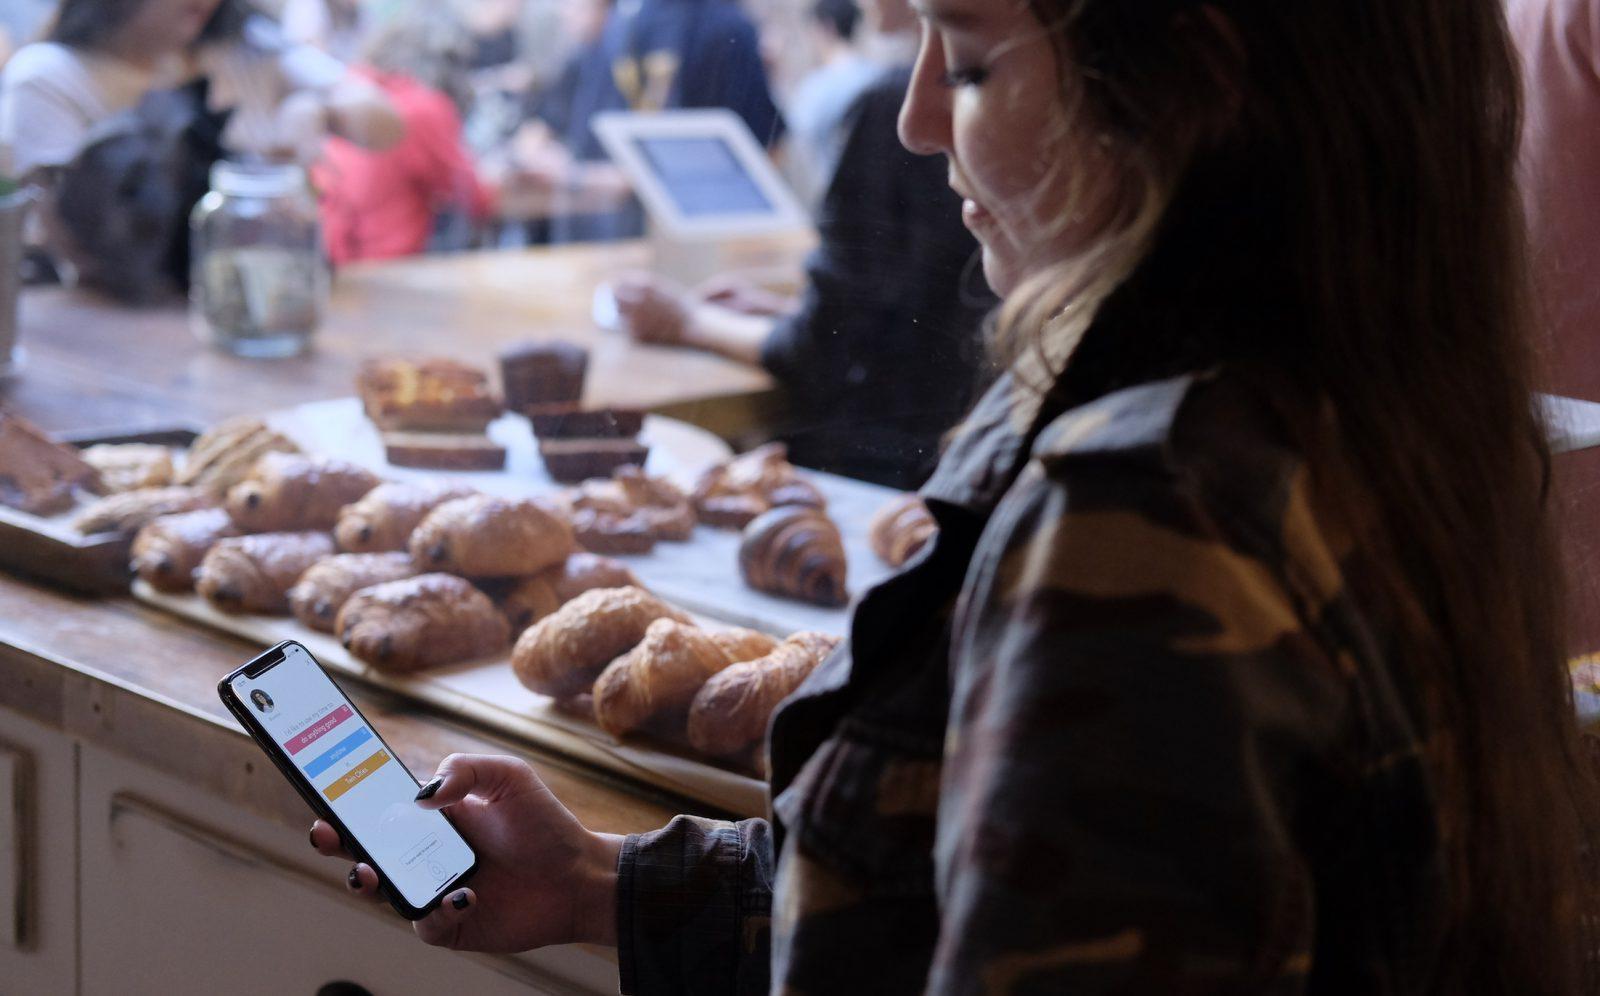 Digitaltrends 2019 - Personalization in tech